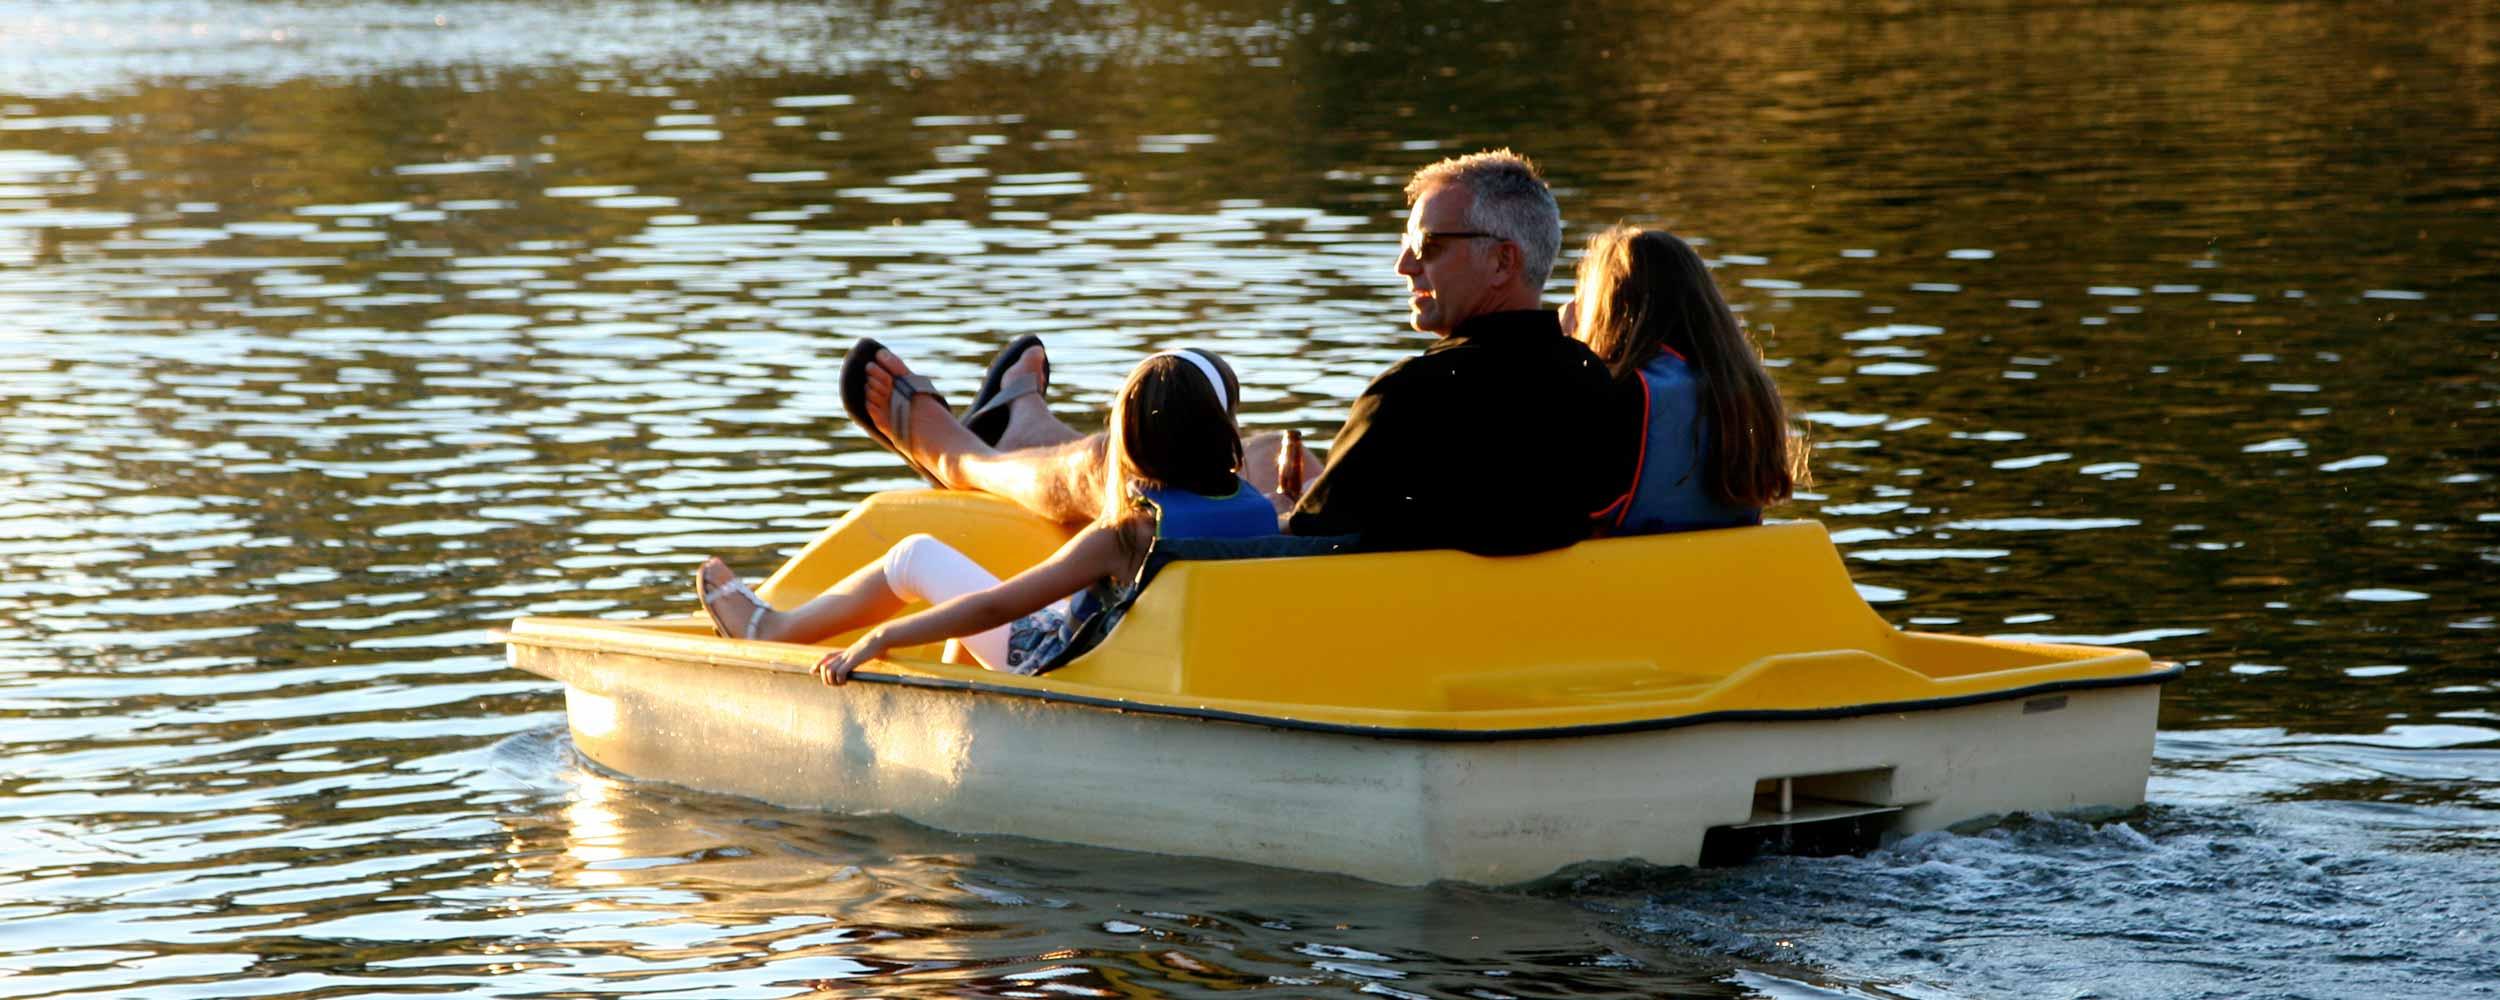 Paddleboating on Alisal Lake - Alisal Resort in Solvang California